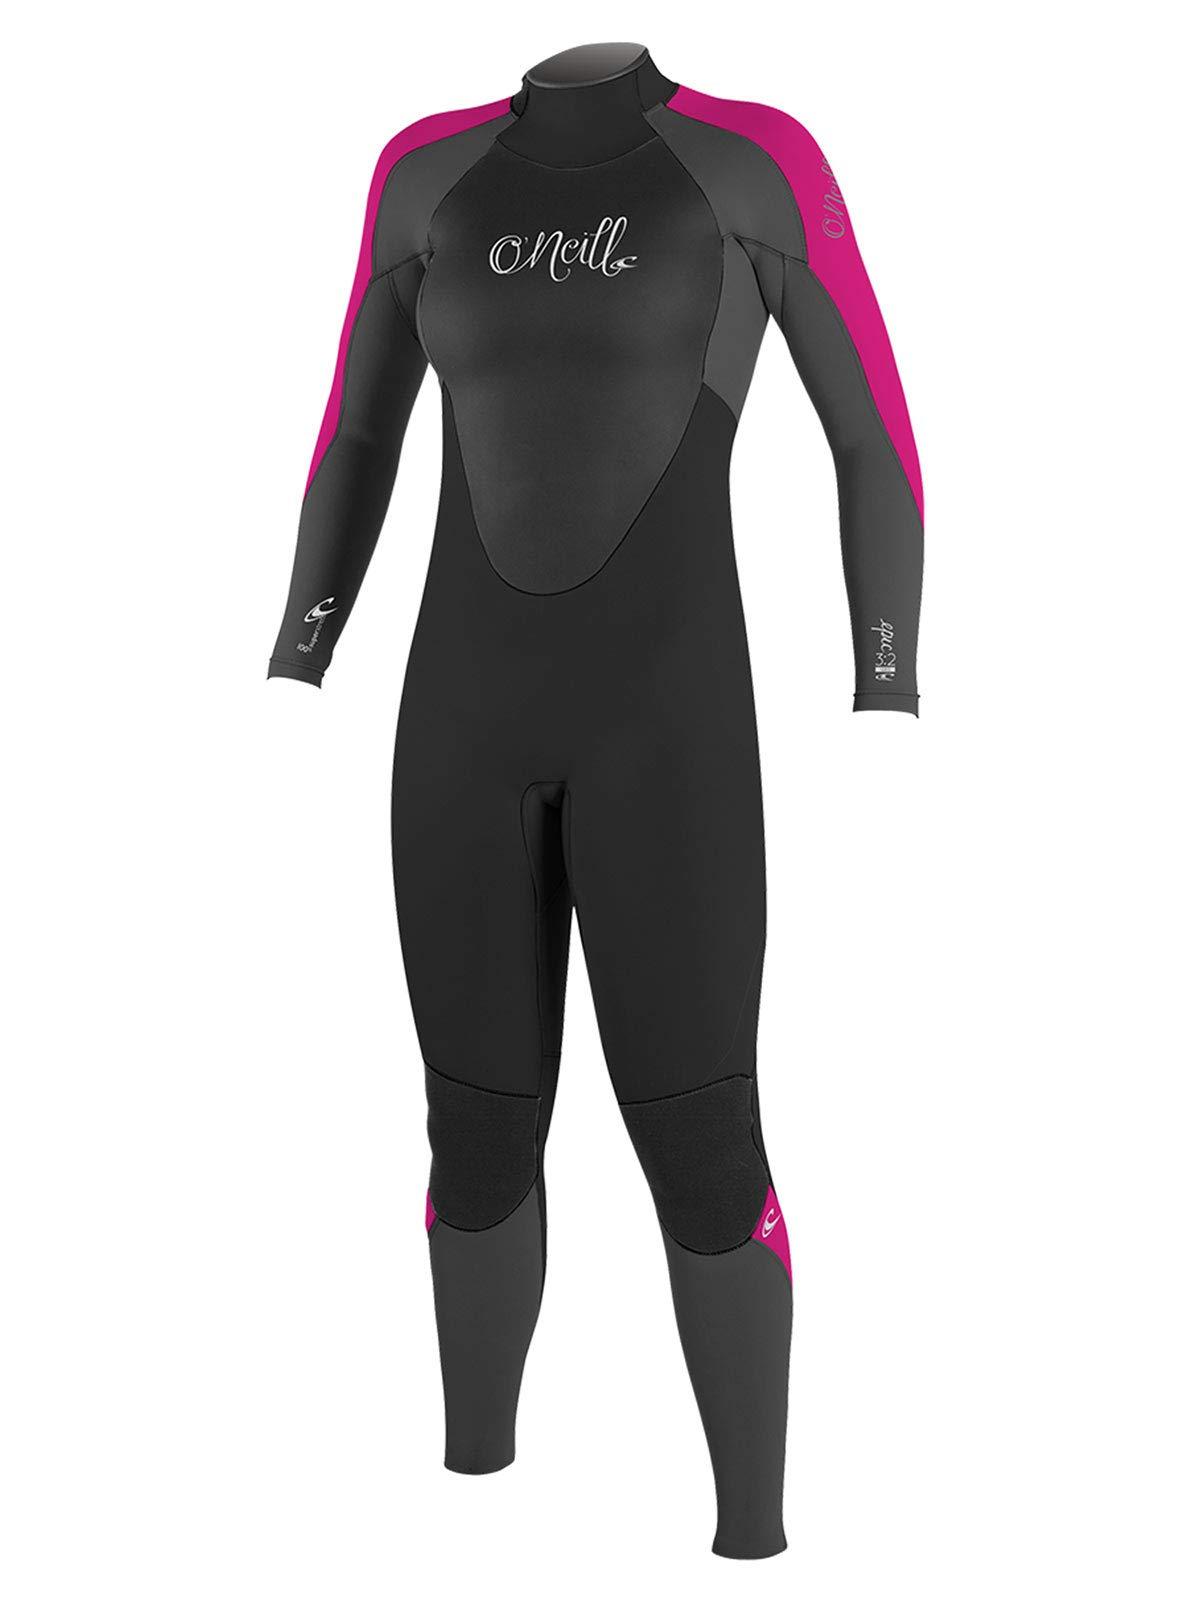 O'Neill Women's Epic 4/3mm Back Zip Full Wetsuit, Black/Graphite/Berry, 4